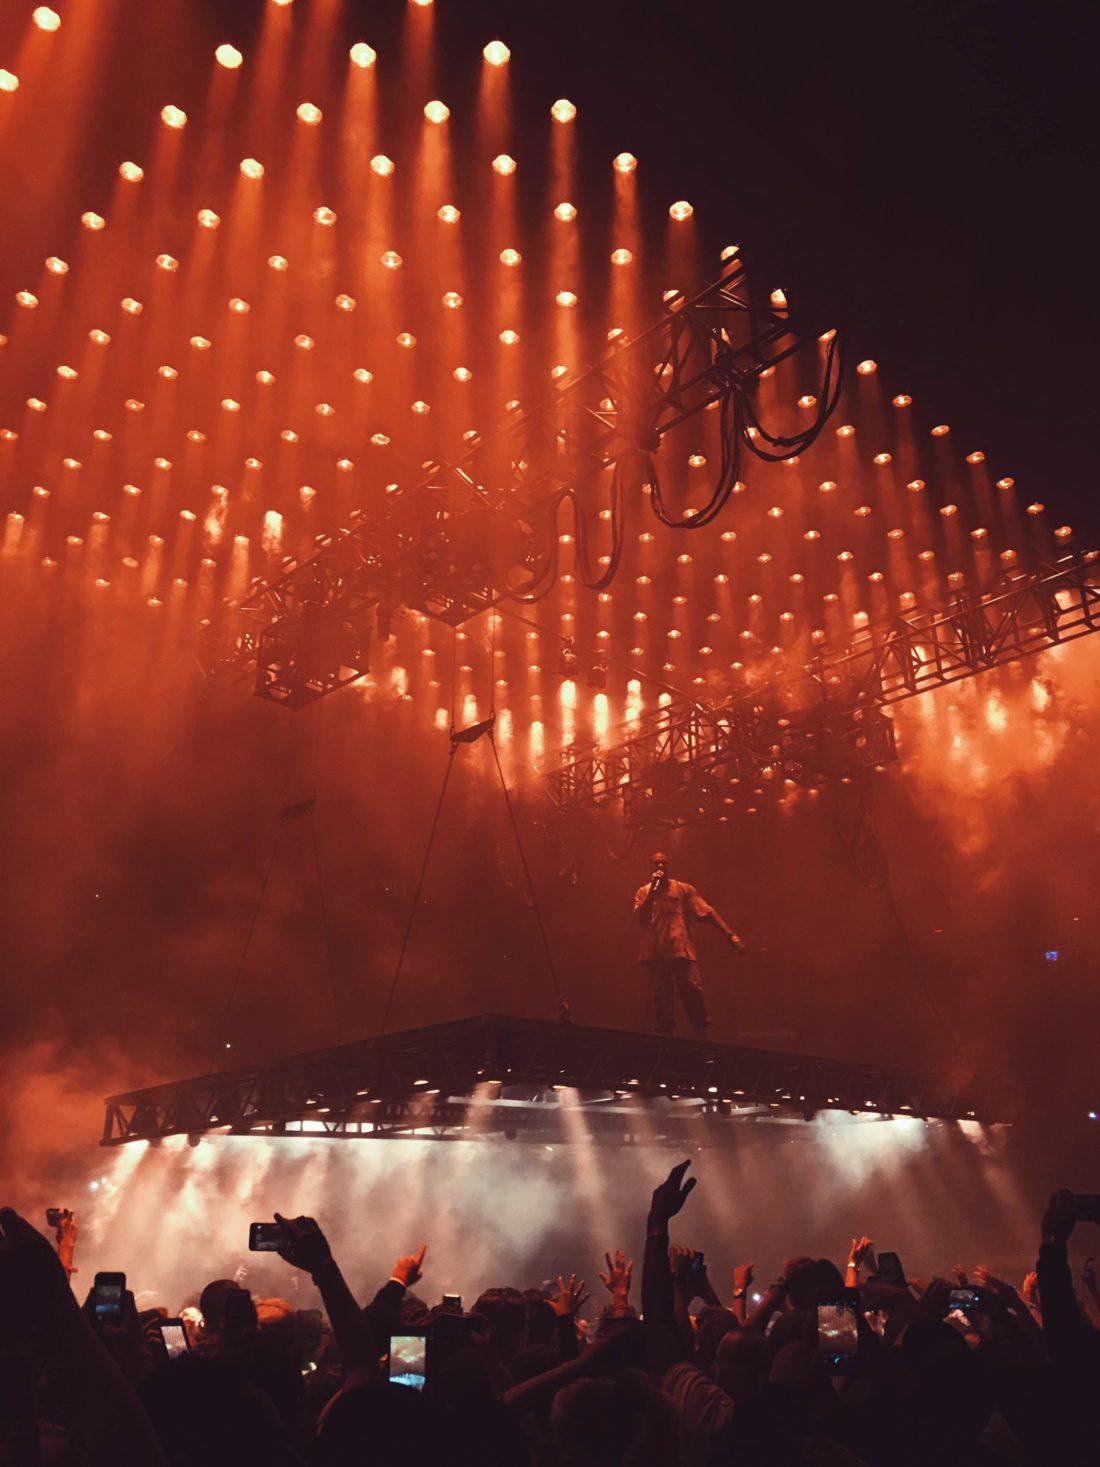 2a4781cd1 Kanye West is back on Twitter